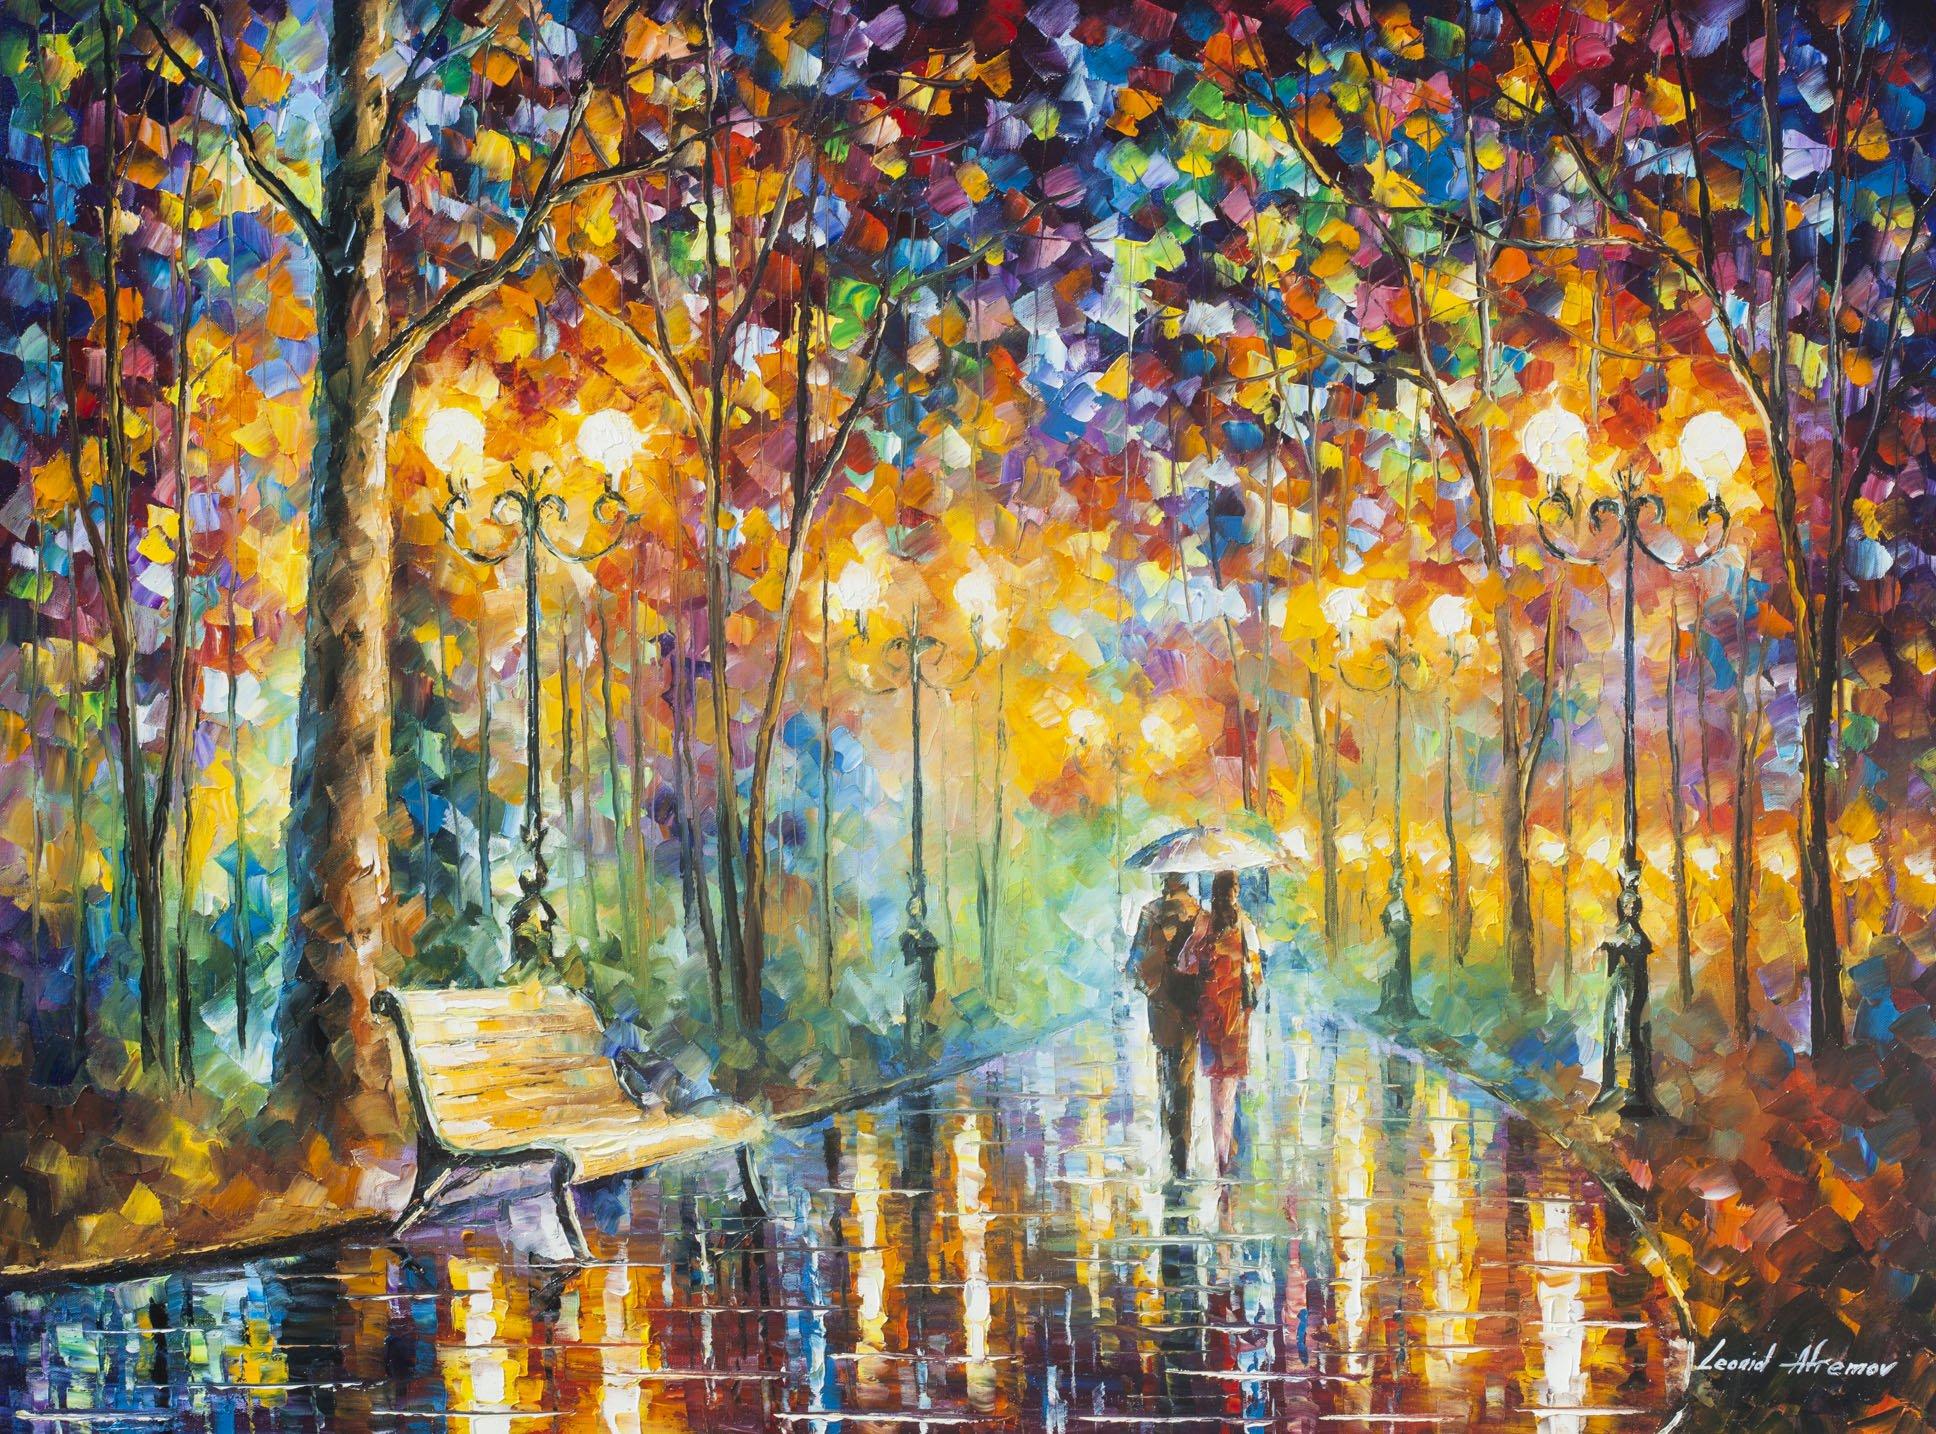 RAINS RUSTLE 3 (30 x 40) - Giclee on Canvas